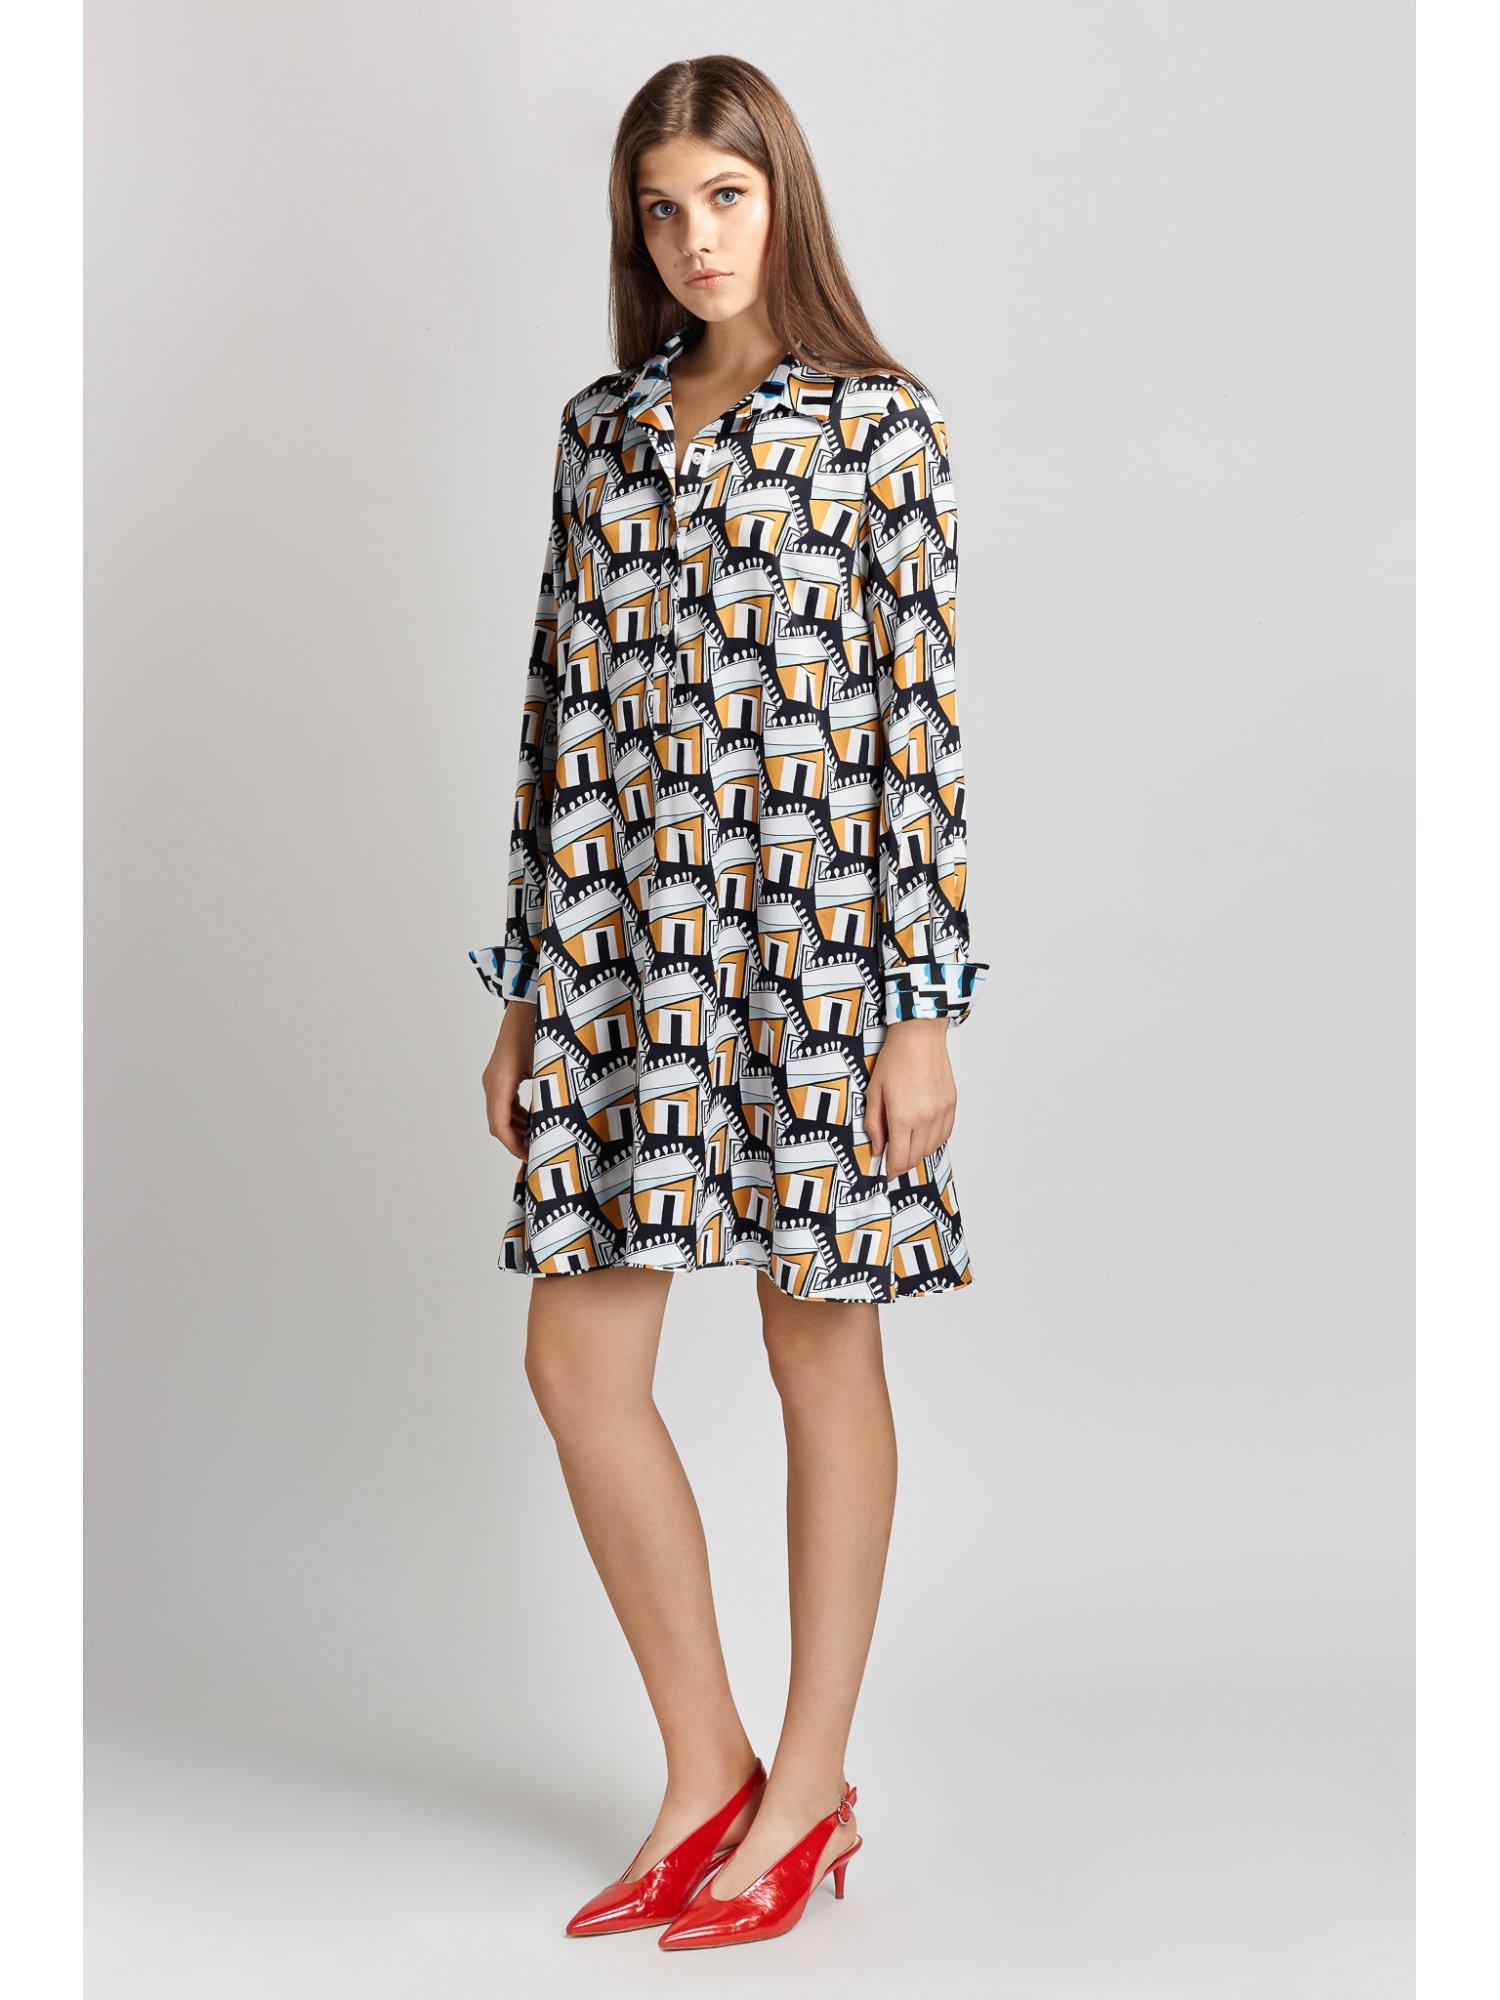 Penelopeia shirt dress